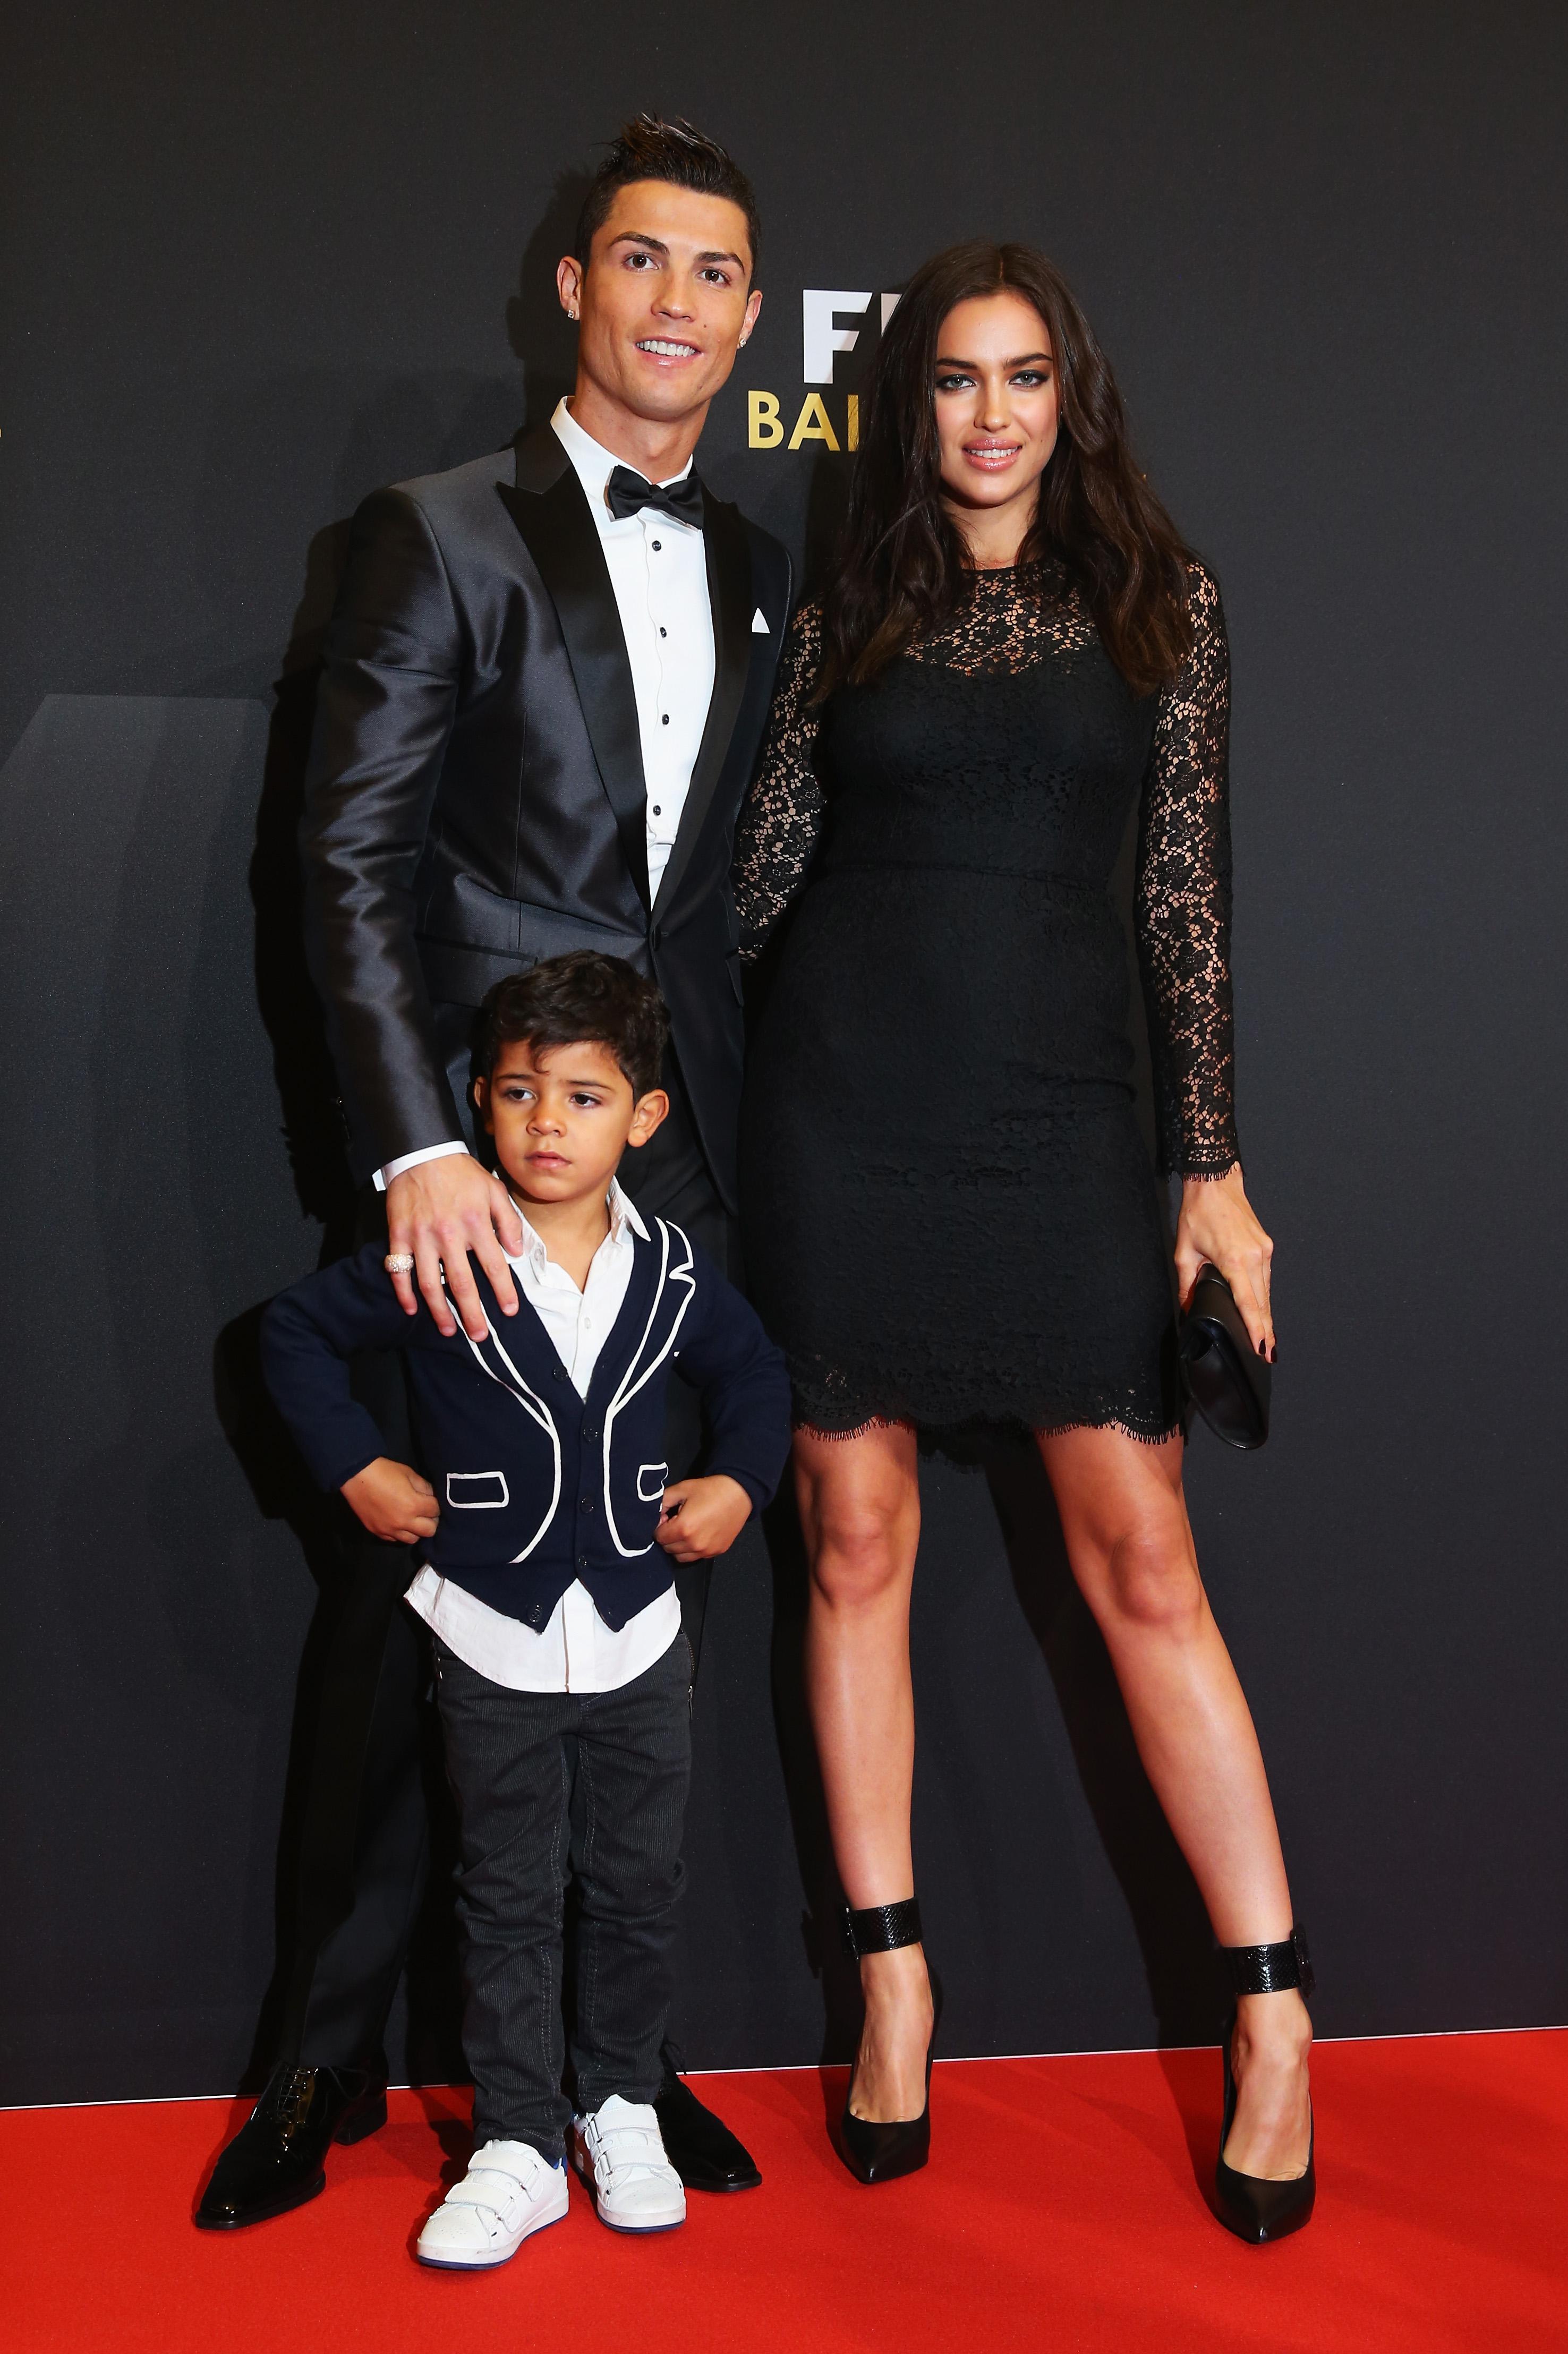 Kim Kardashian And Cristiano Ronaldo Pictures : kardashian, cristiano, ronaldo, pictures, Cristiano, Ronaldo, Kardashian, Kissing, Pictures